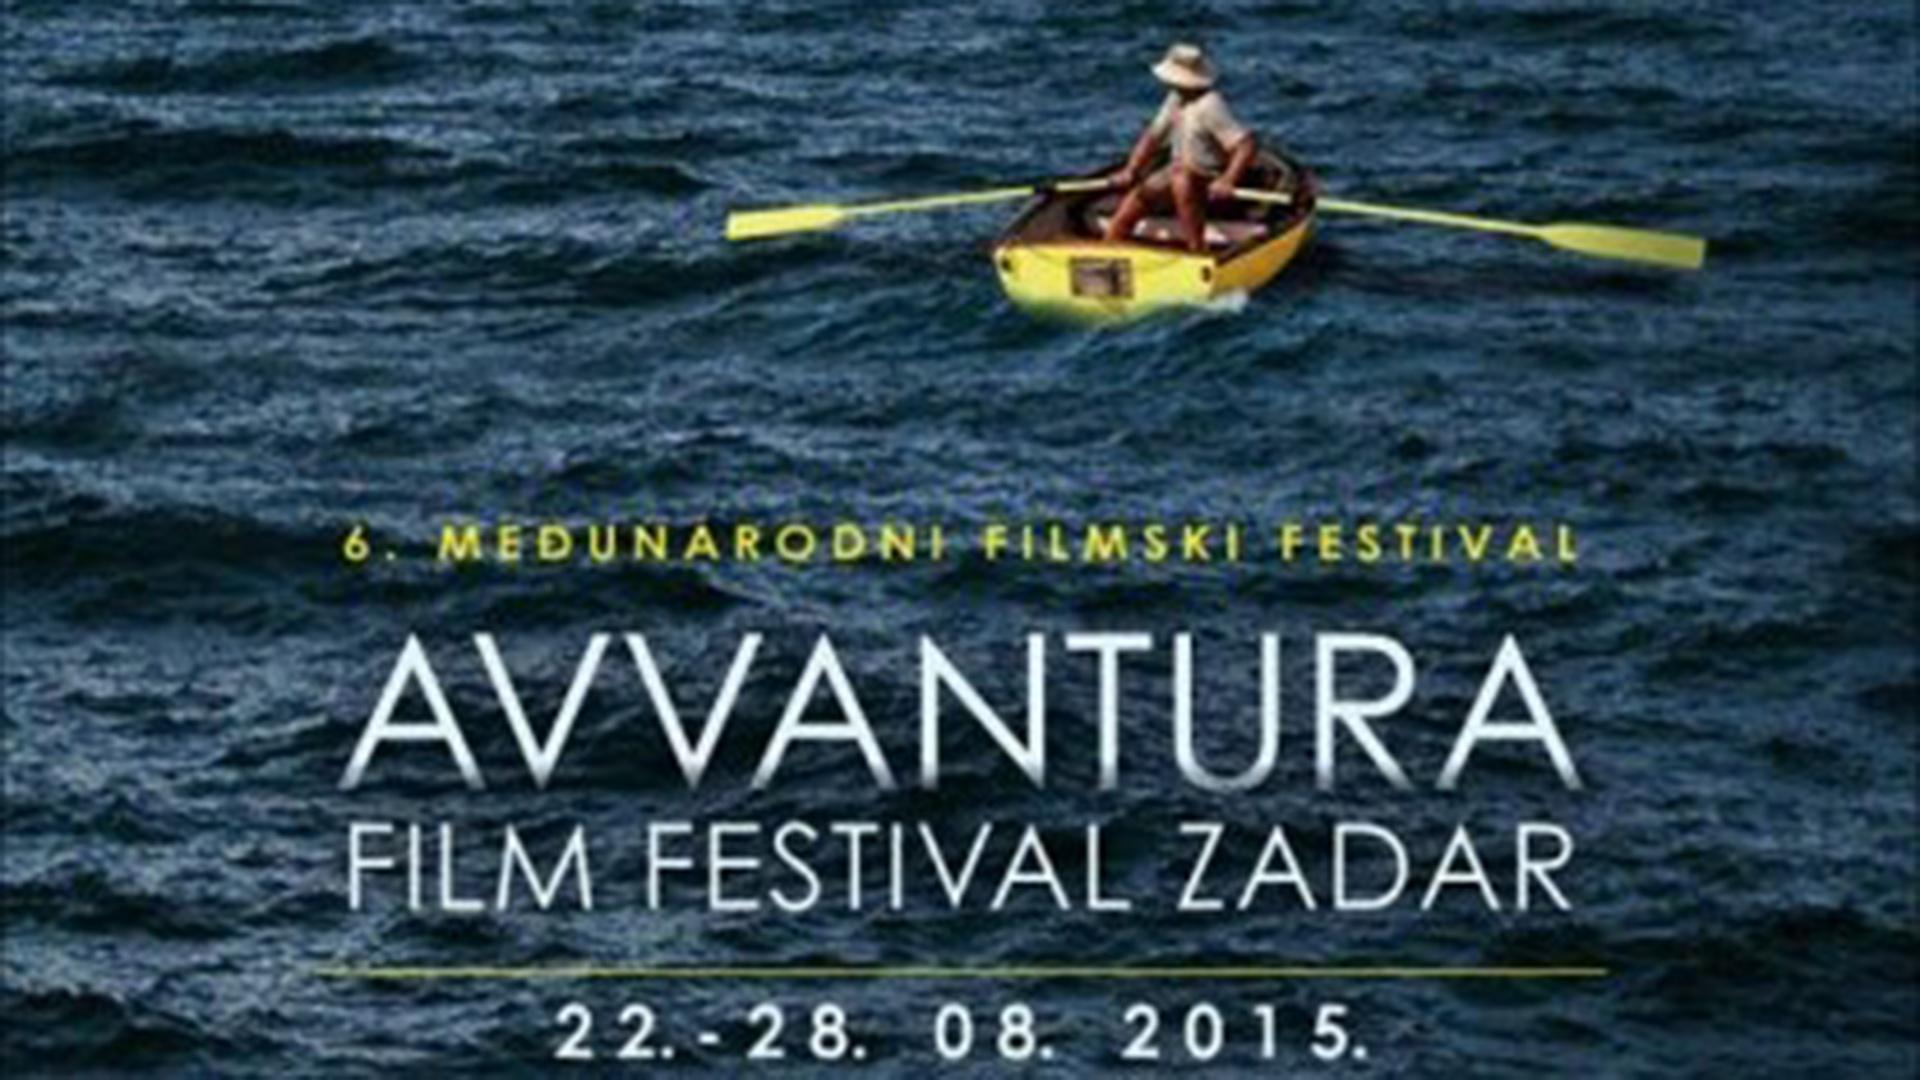 Avvantura Film Festival Zadar 2015